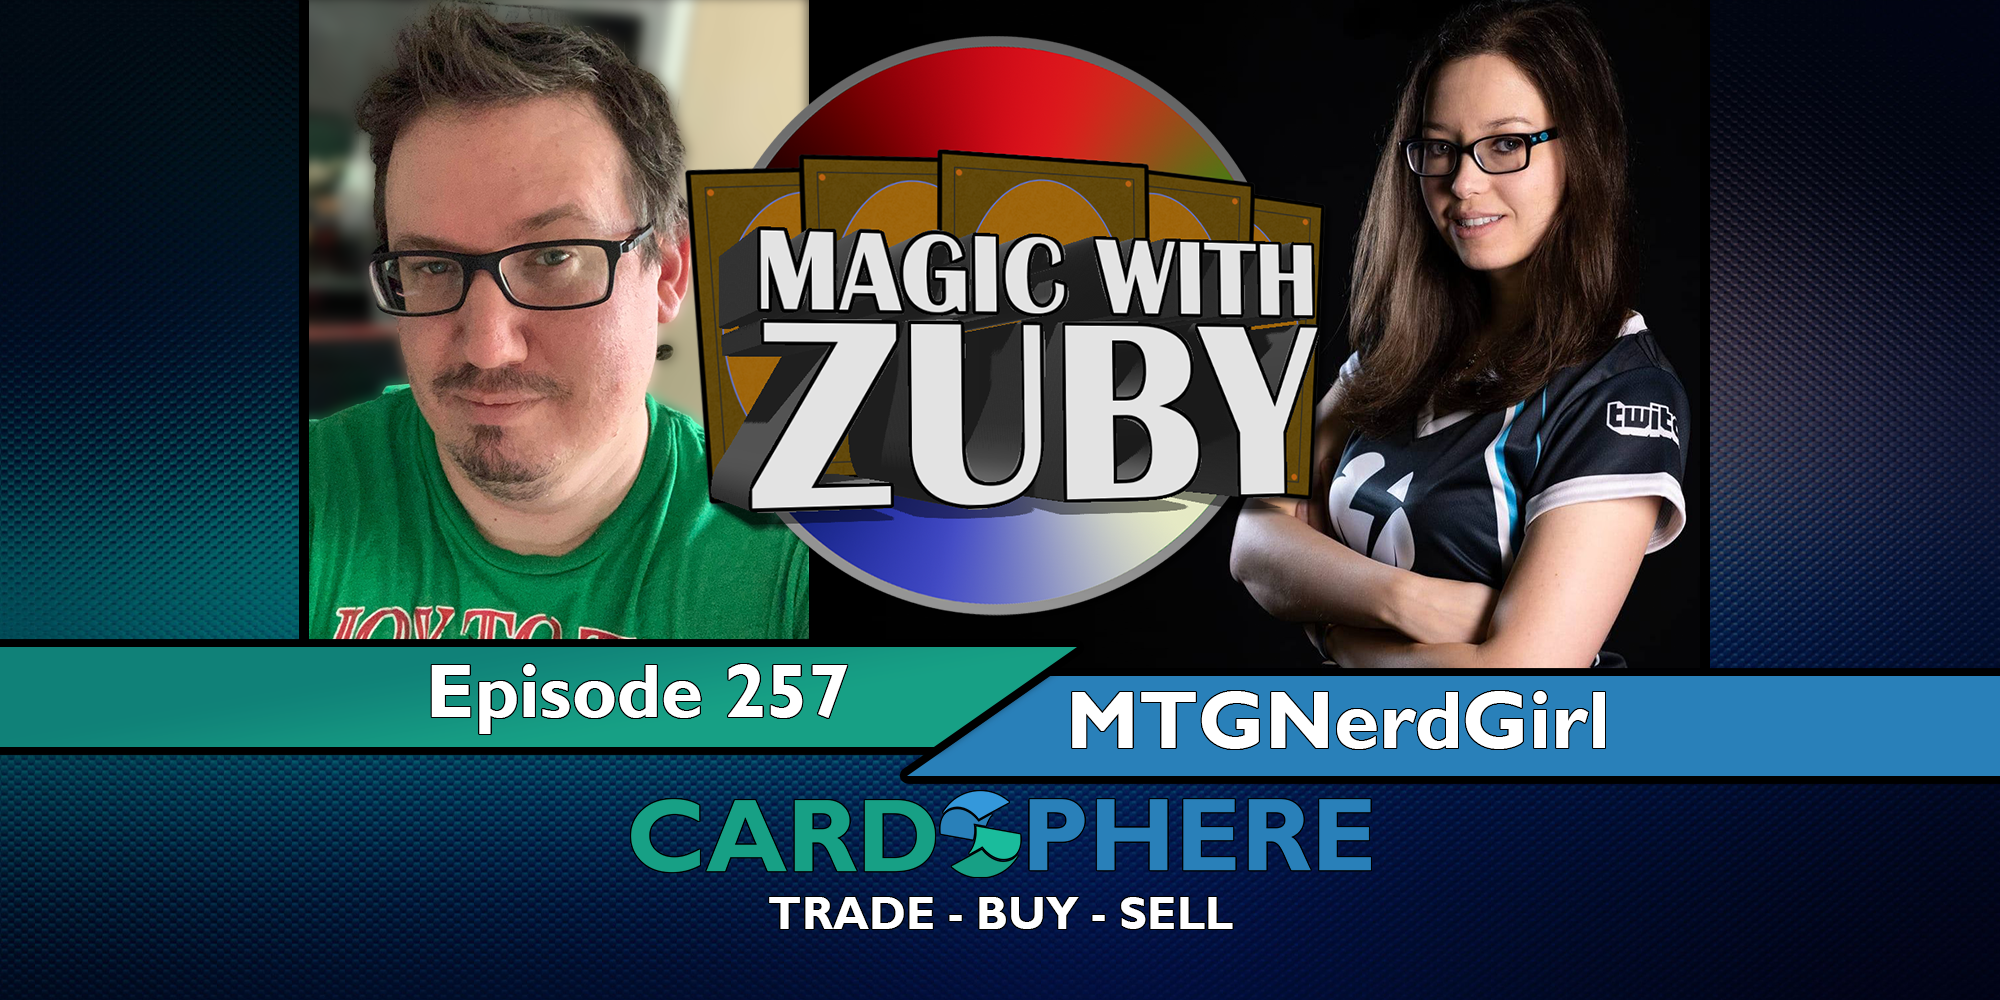 Magic With Zuby Episode 257 - MTGNerdGirl